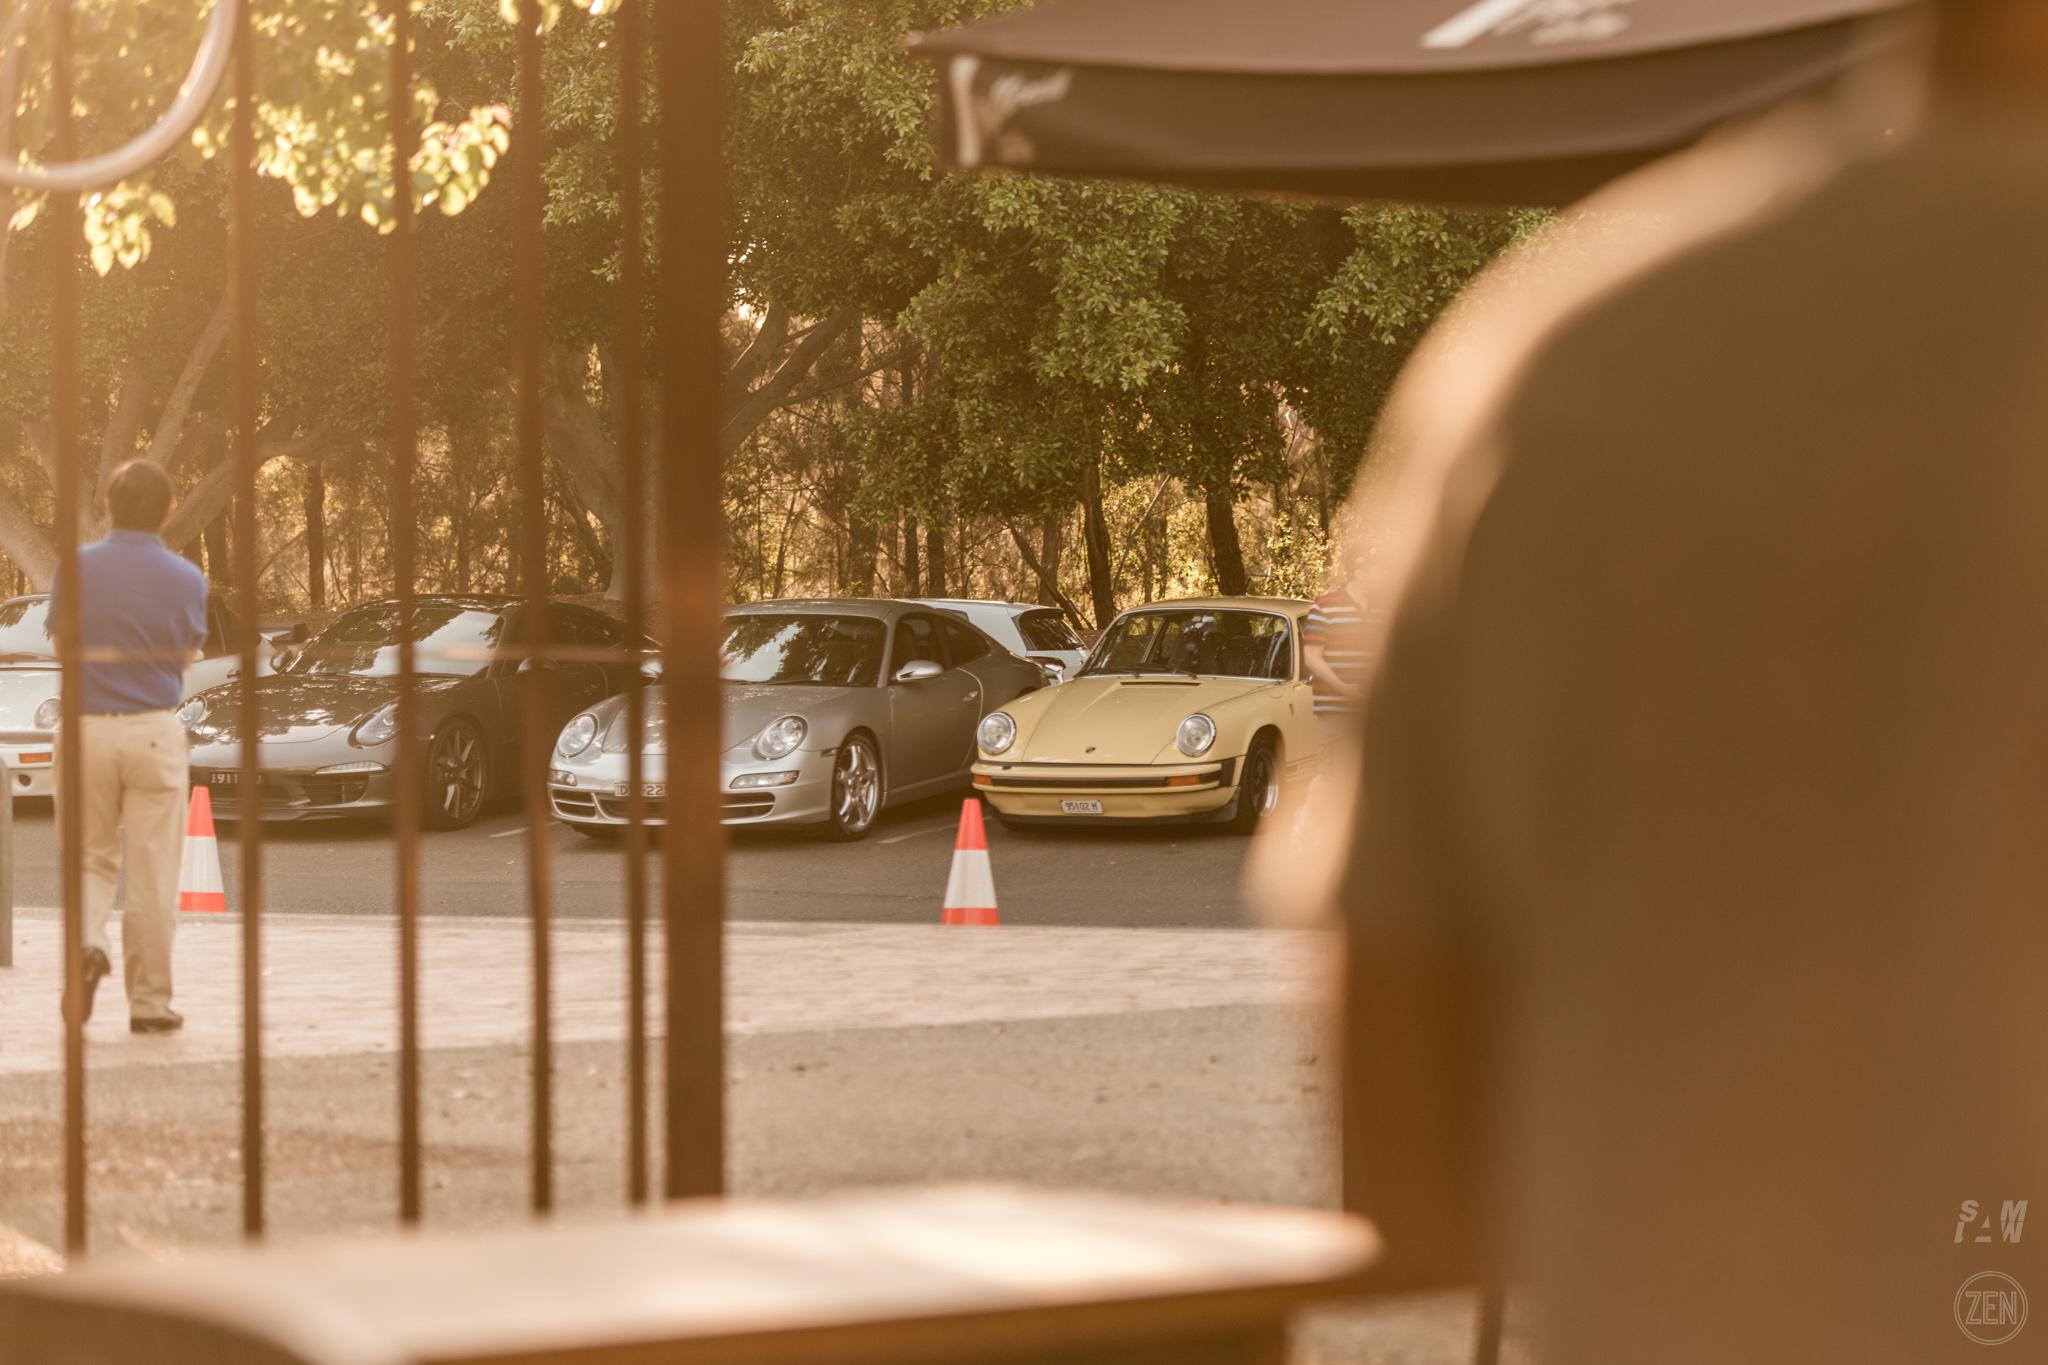 2019-10-27 - Autohaus Porsches & Coffee 039